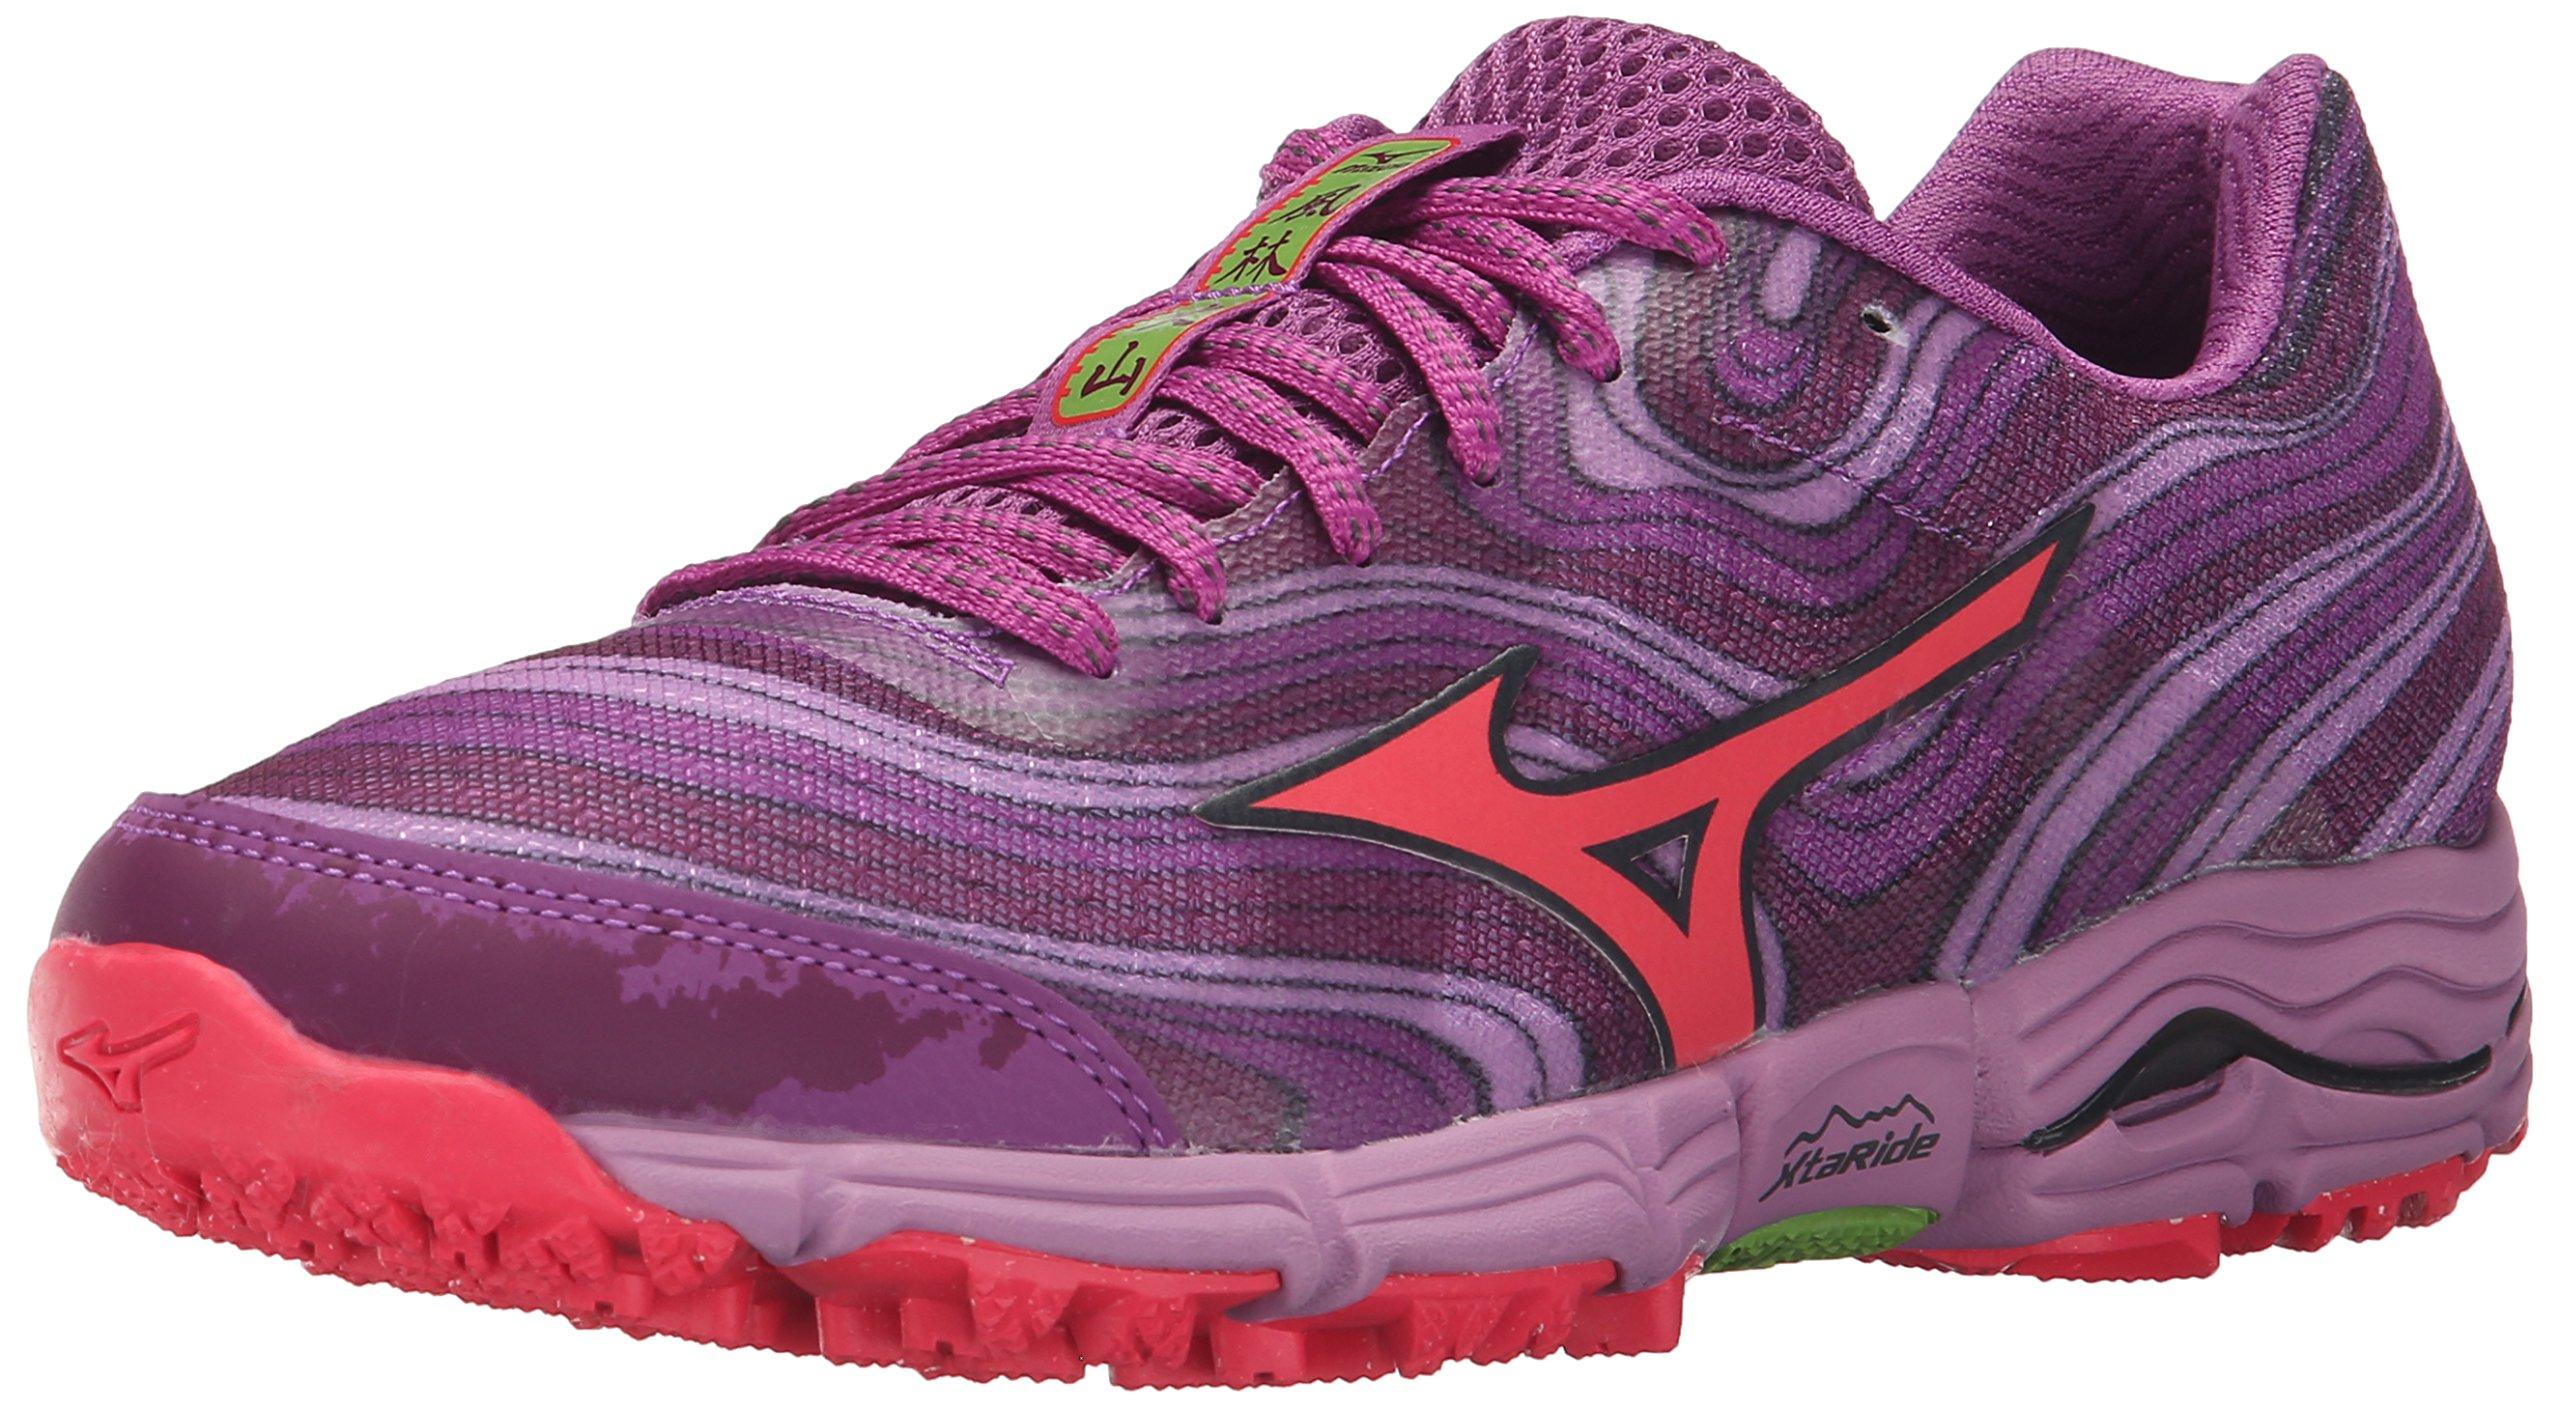 Mizuno Women's Wave Kazan Trail Running Shoe, Purple/Pink, 8.5 B US